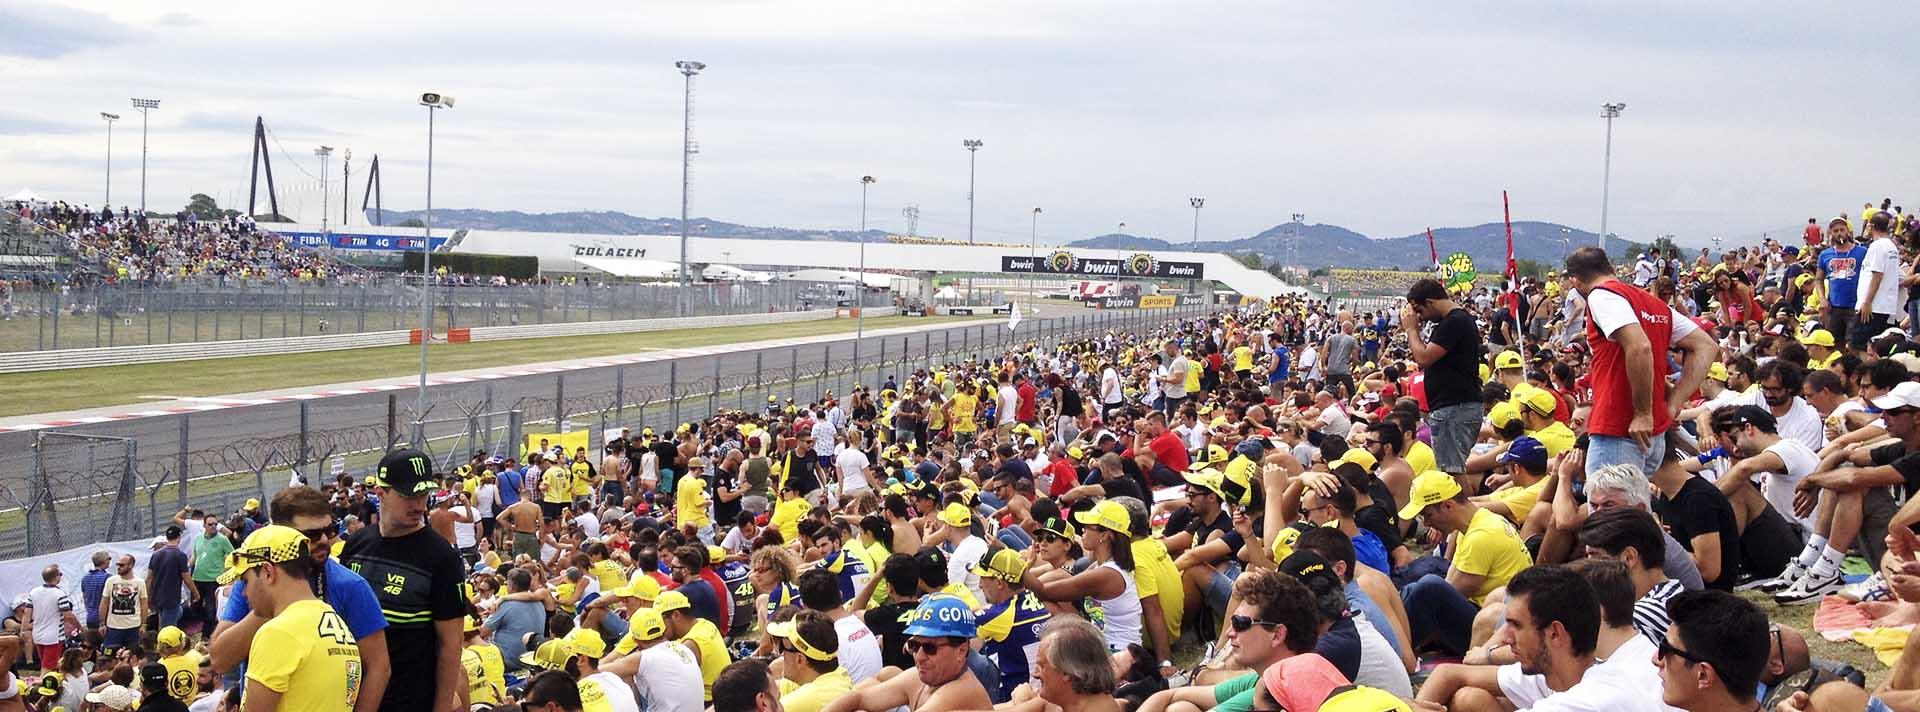 Circuito San Marino : Mundial moto gp en circuito misano adriático